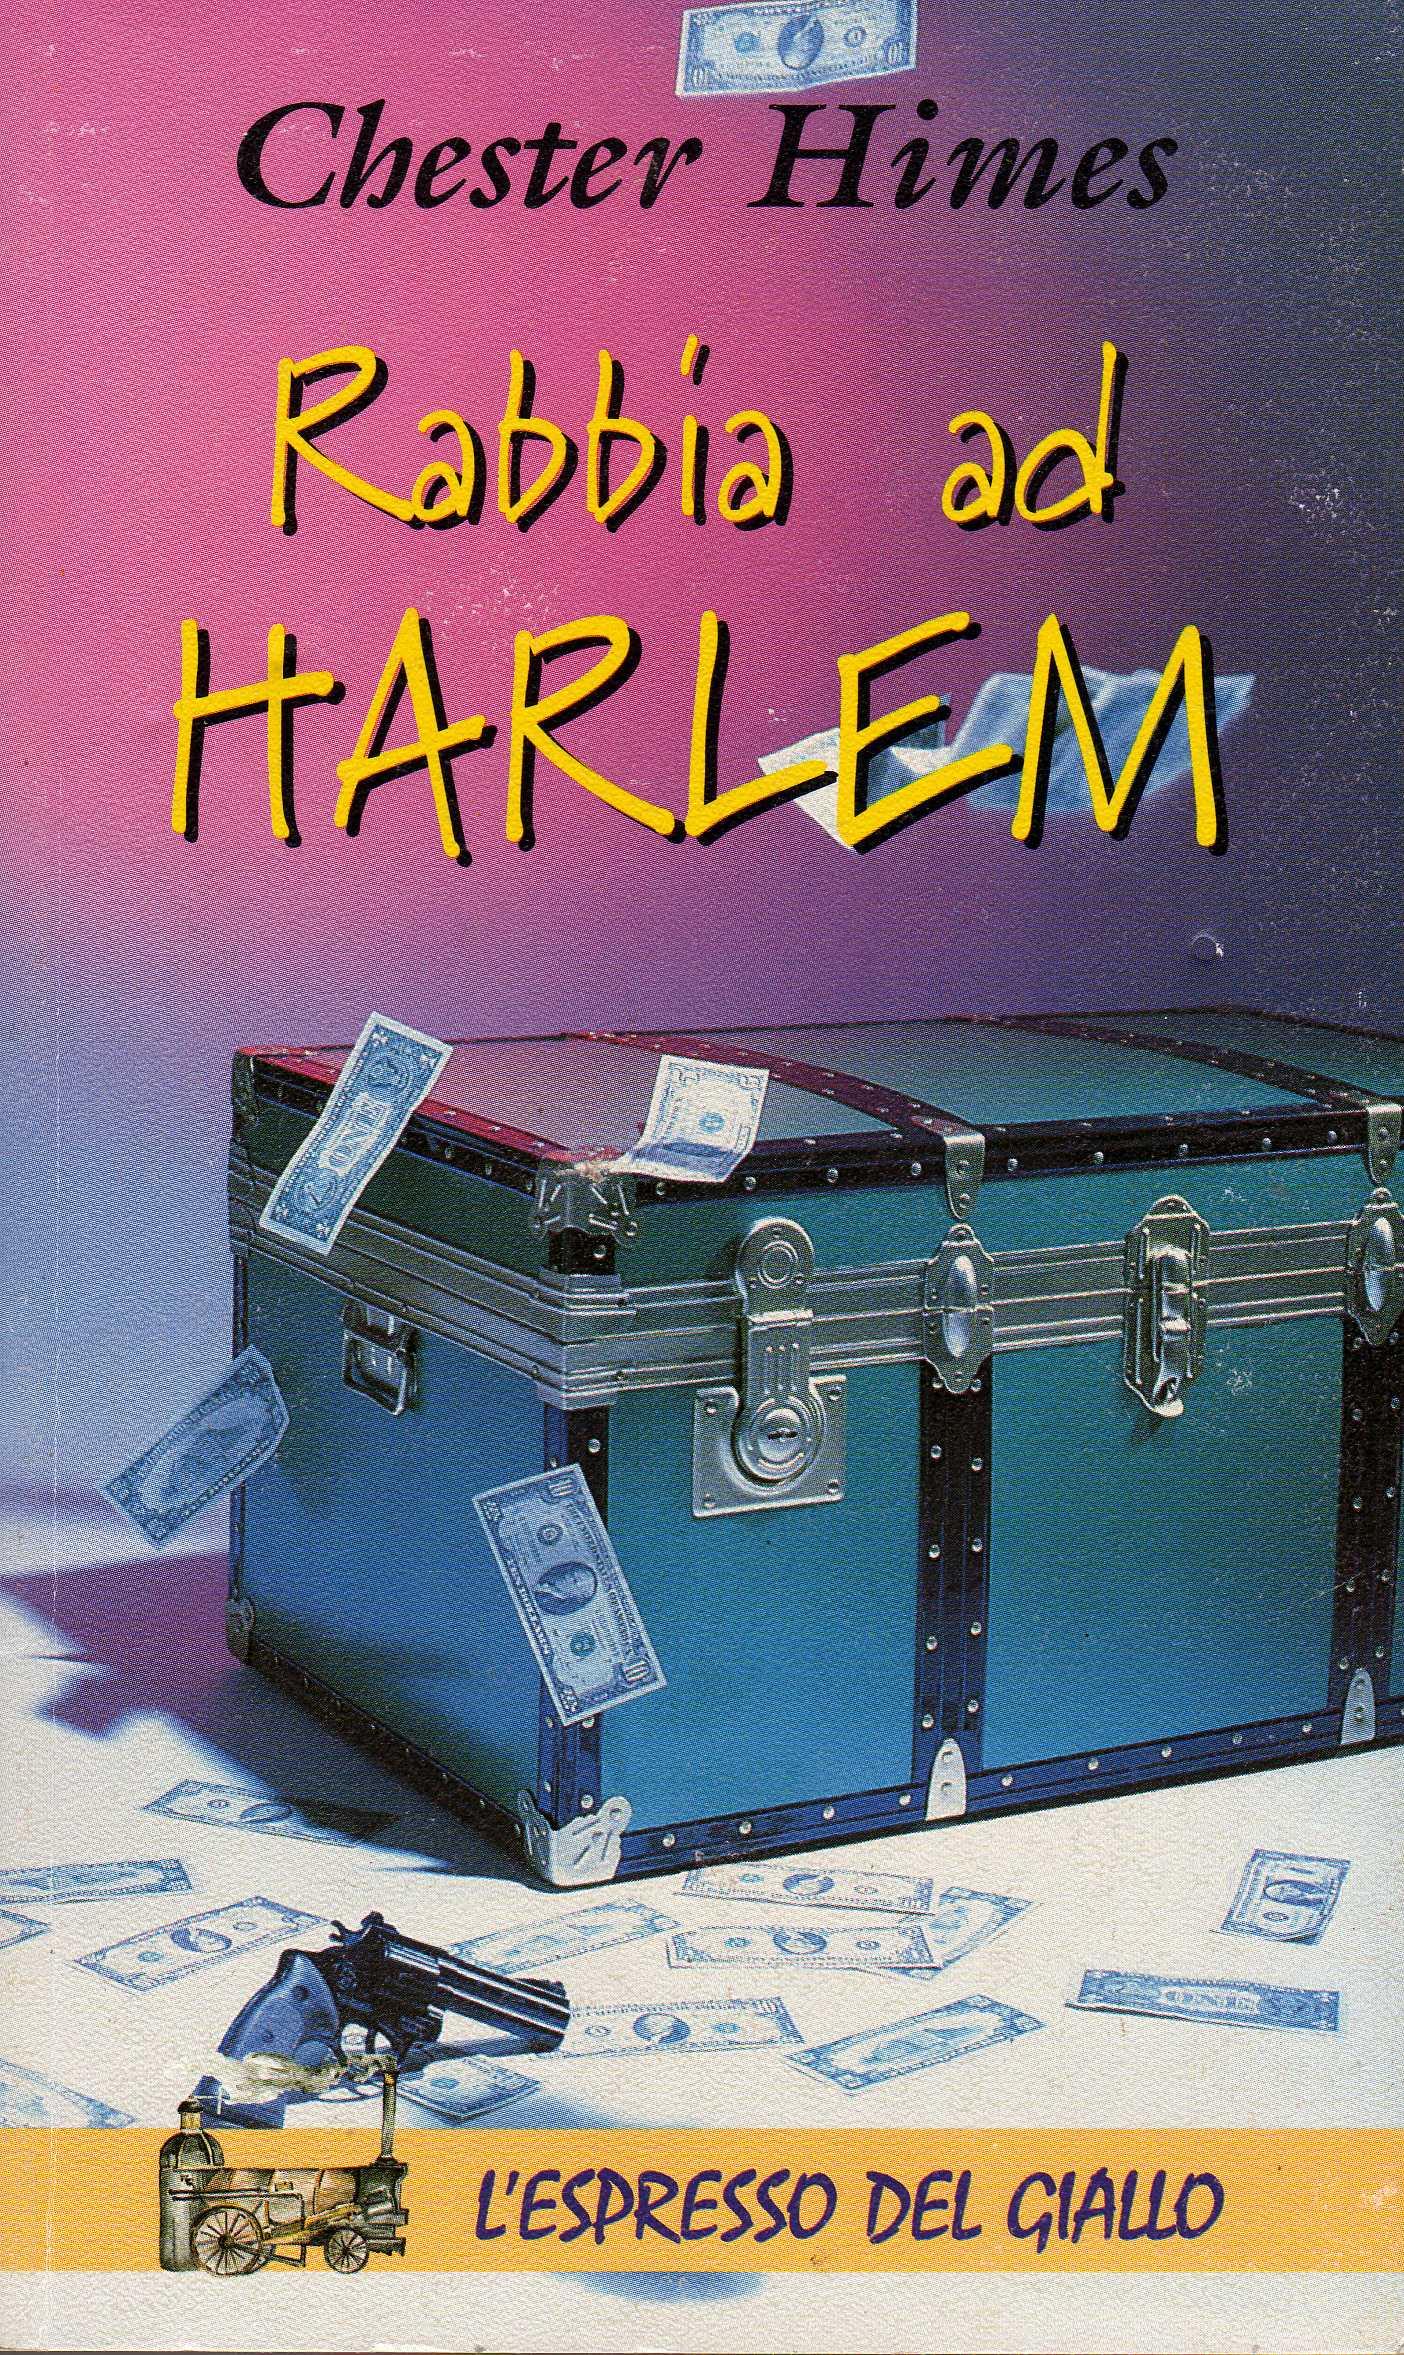 Rabbia ad Harlem